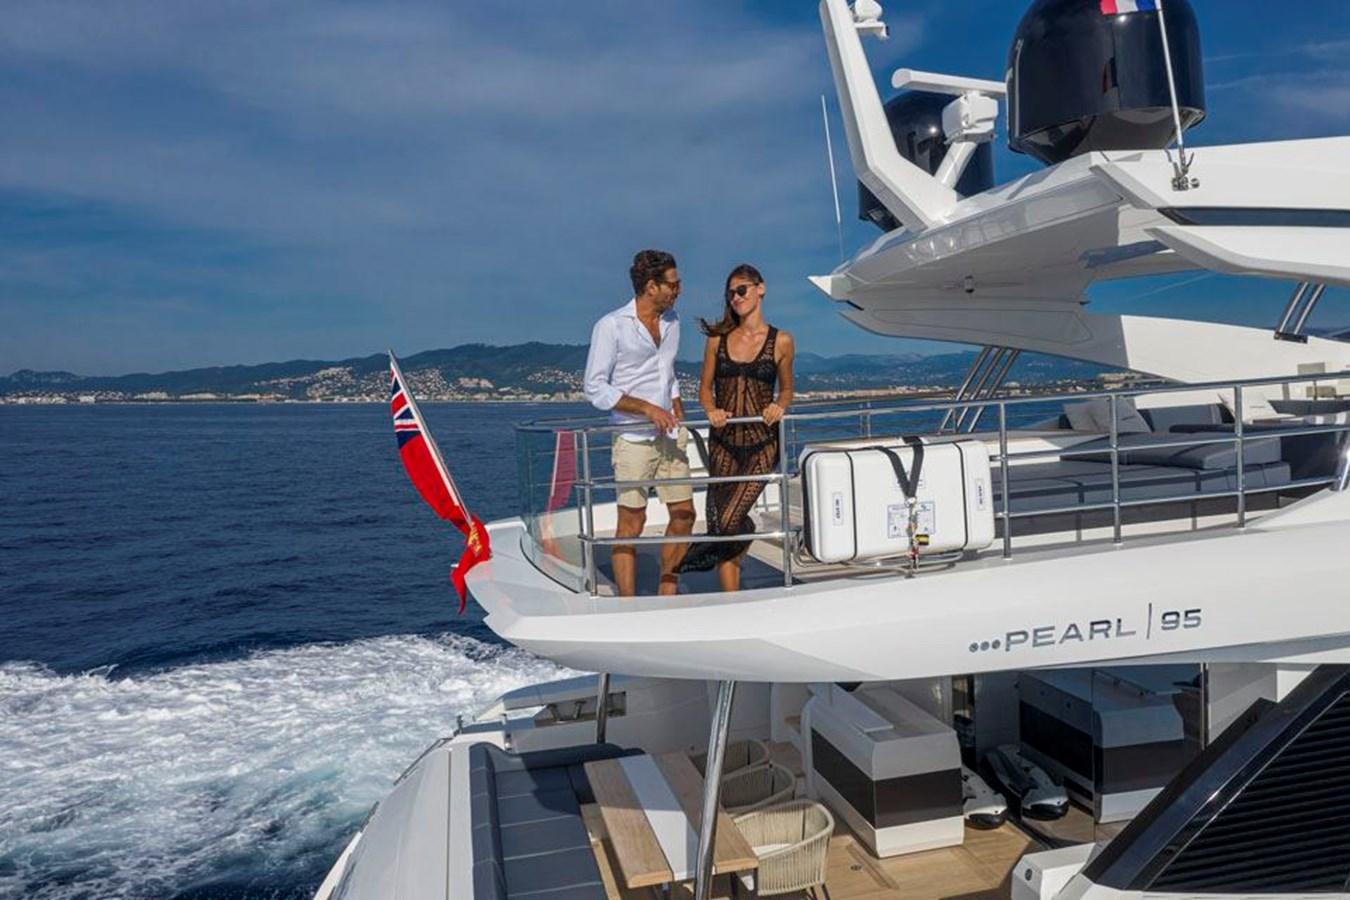 pearl-95-58 2020 PEARL MOTOR YACHTS Pearl 95 Motor Yacht 2737968